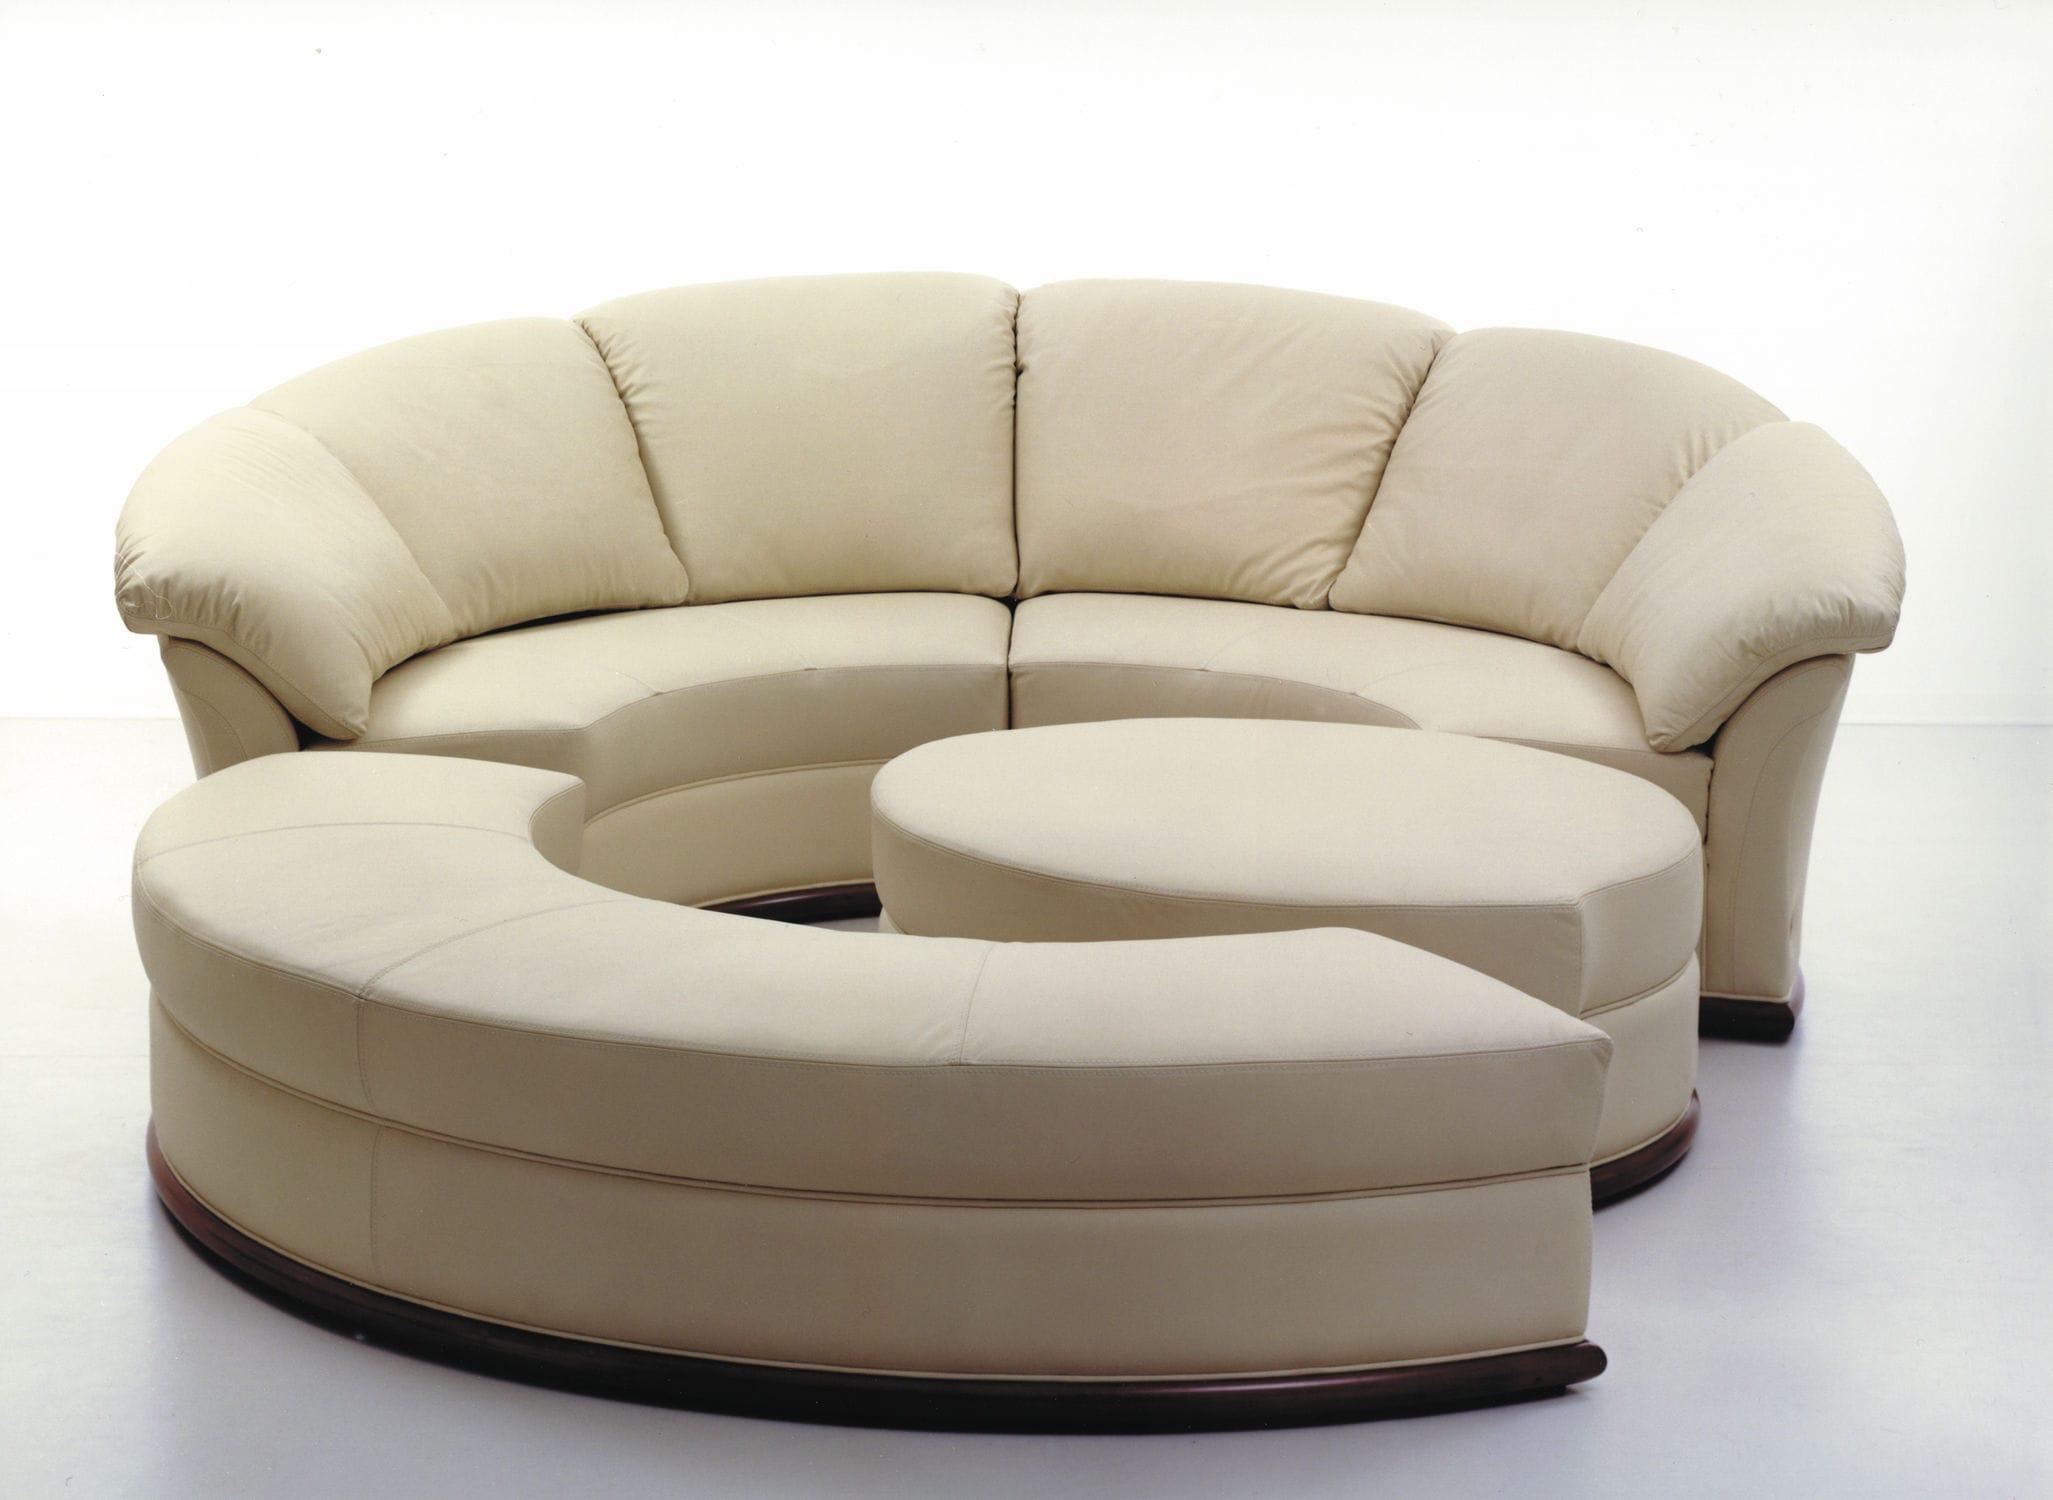 Sofa rund oval  Rundes Sofa / modulierbar / modern / Leder - PLANET - Nieri